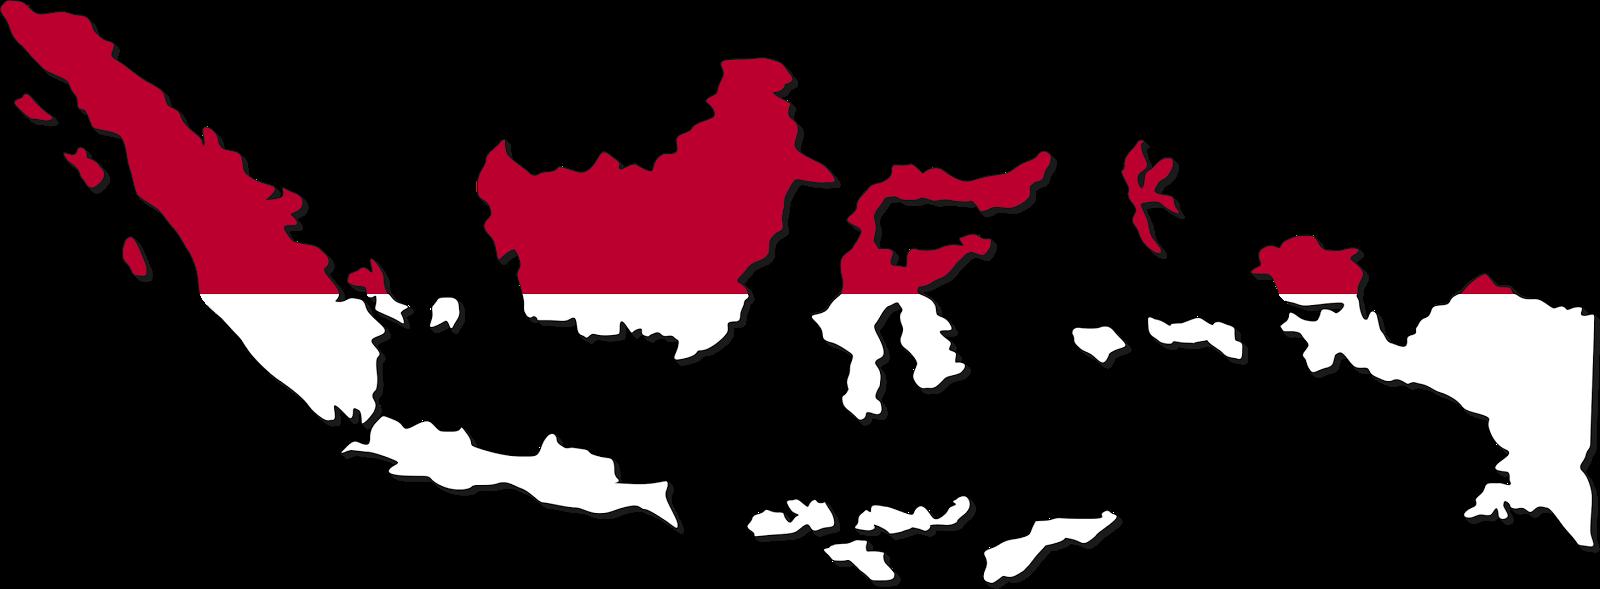 gambar peta indonesia 5 1